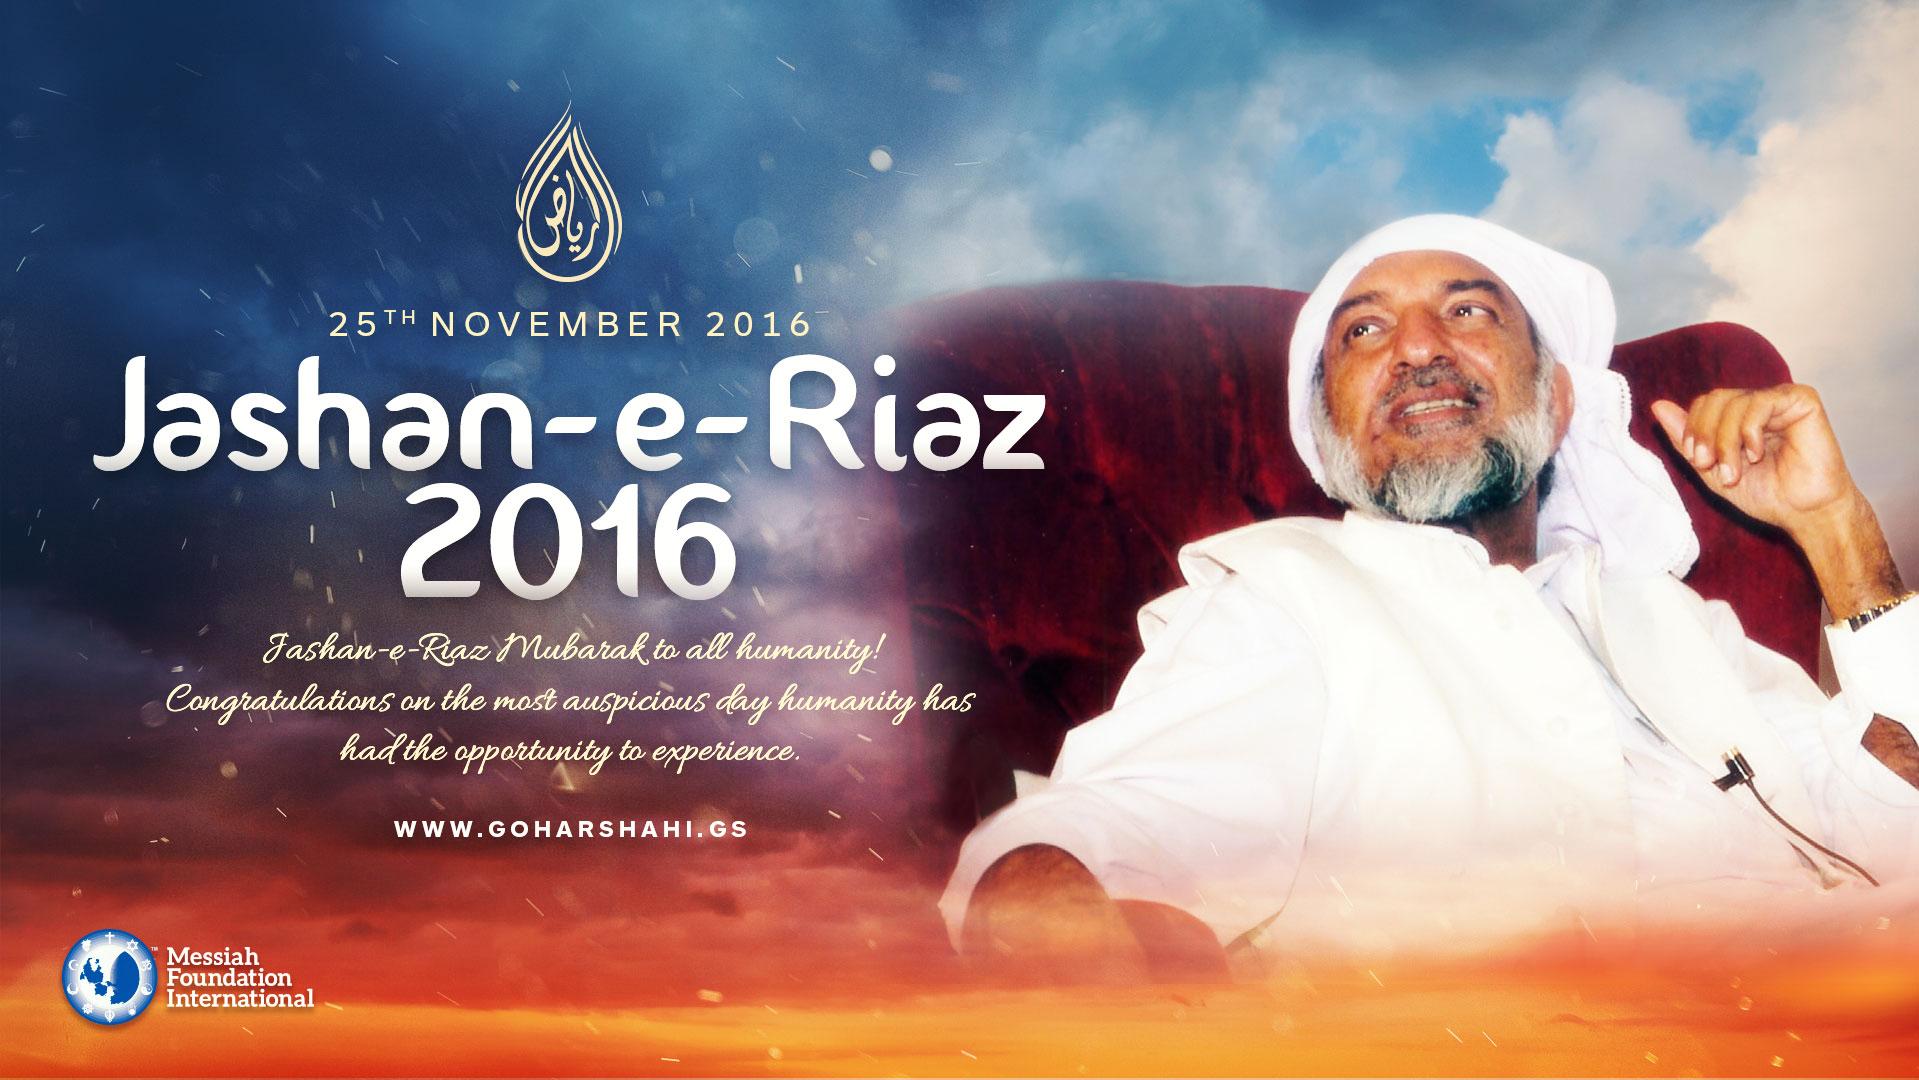 jashan-e-riaz-2016-v3